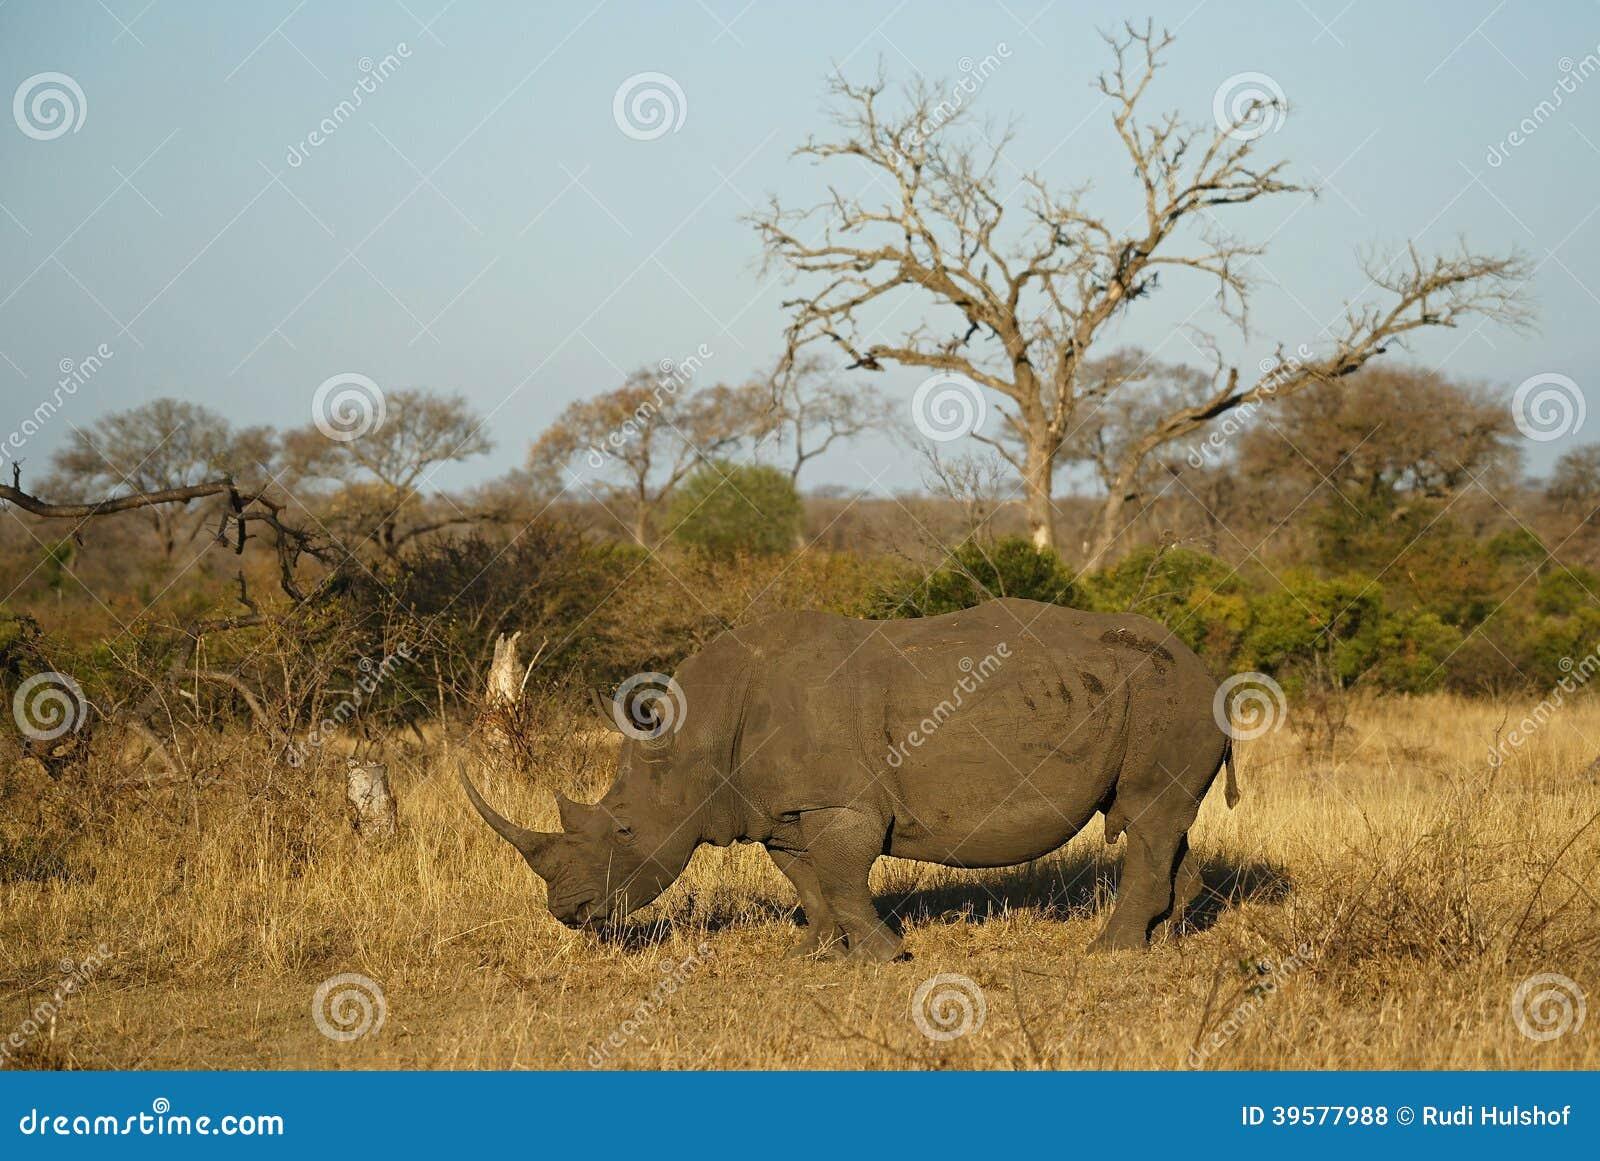 Rhino In African Environment Stock Photo - Image of grazer